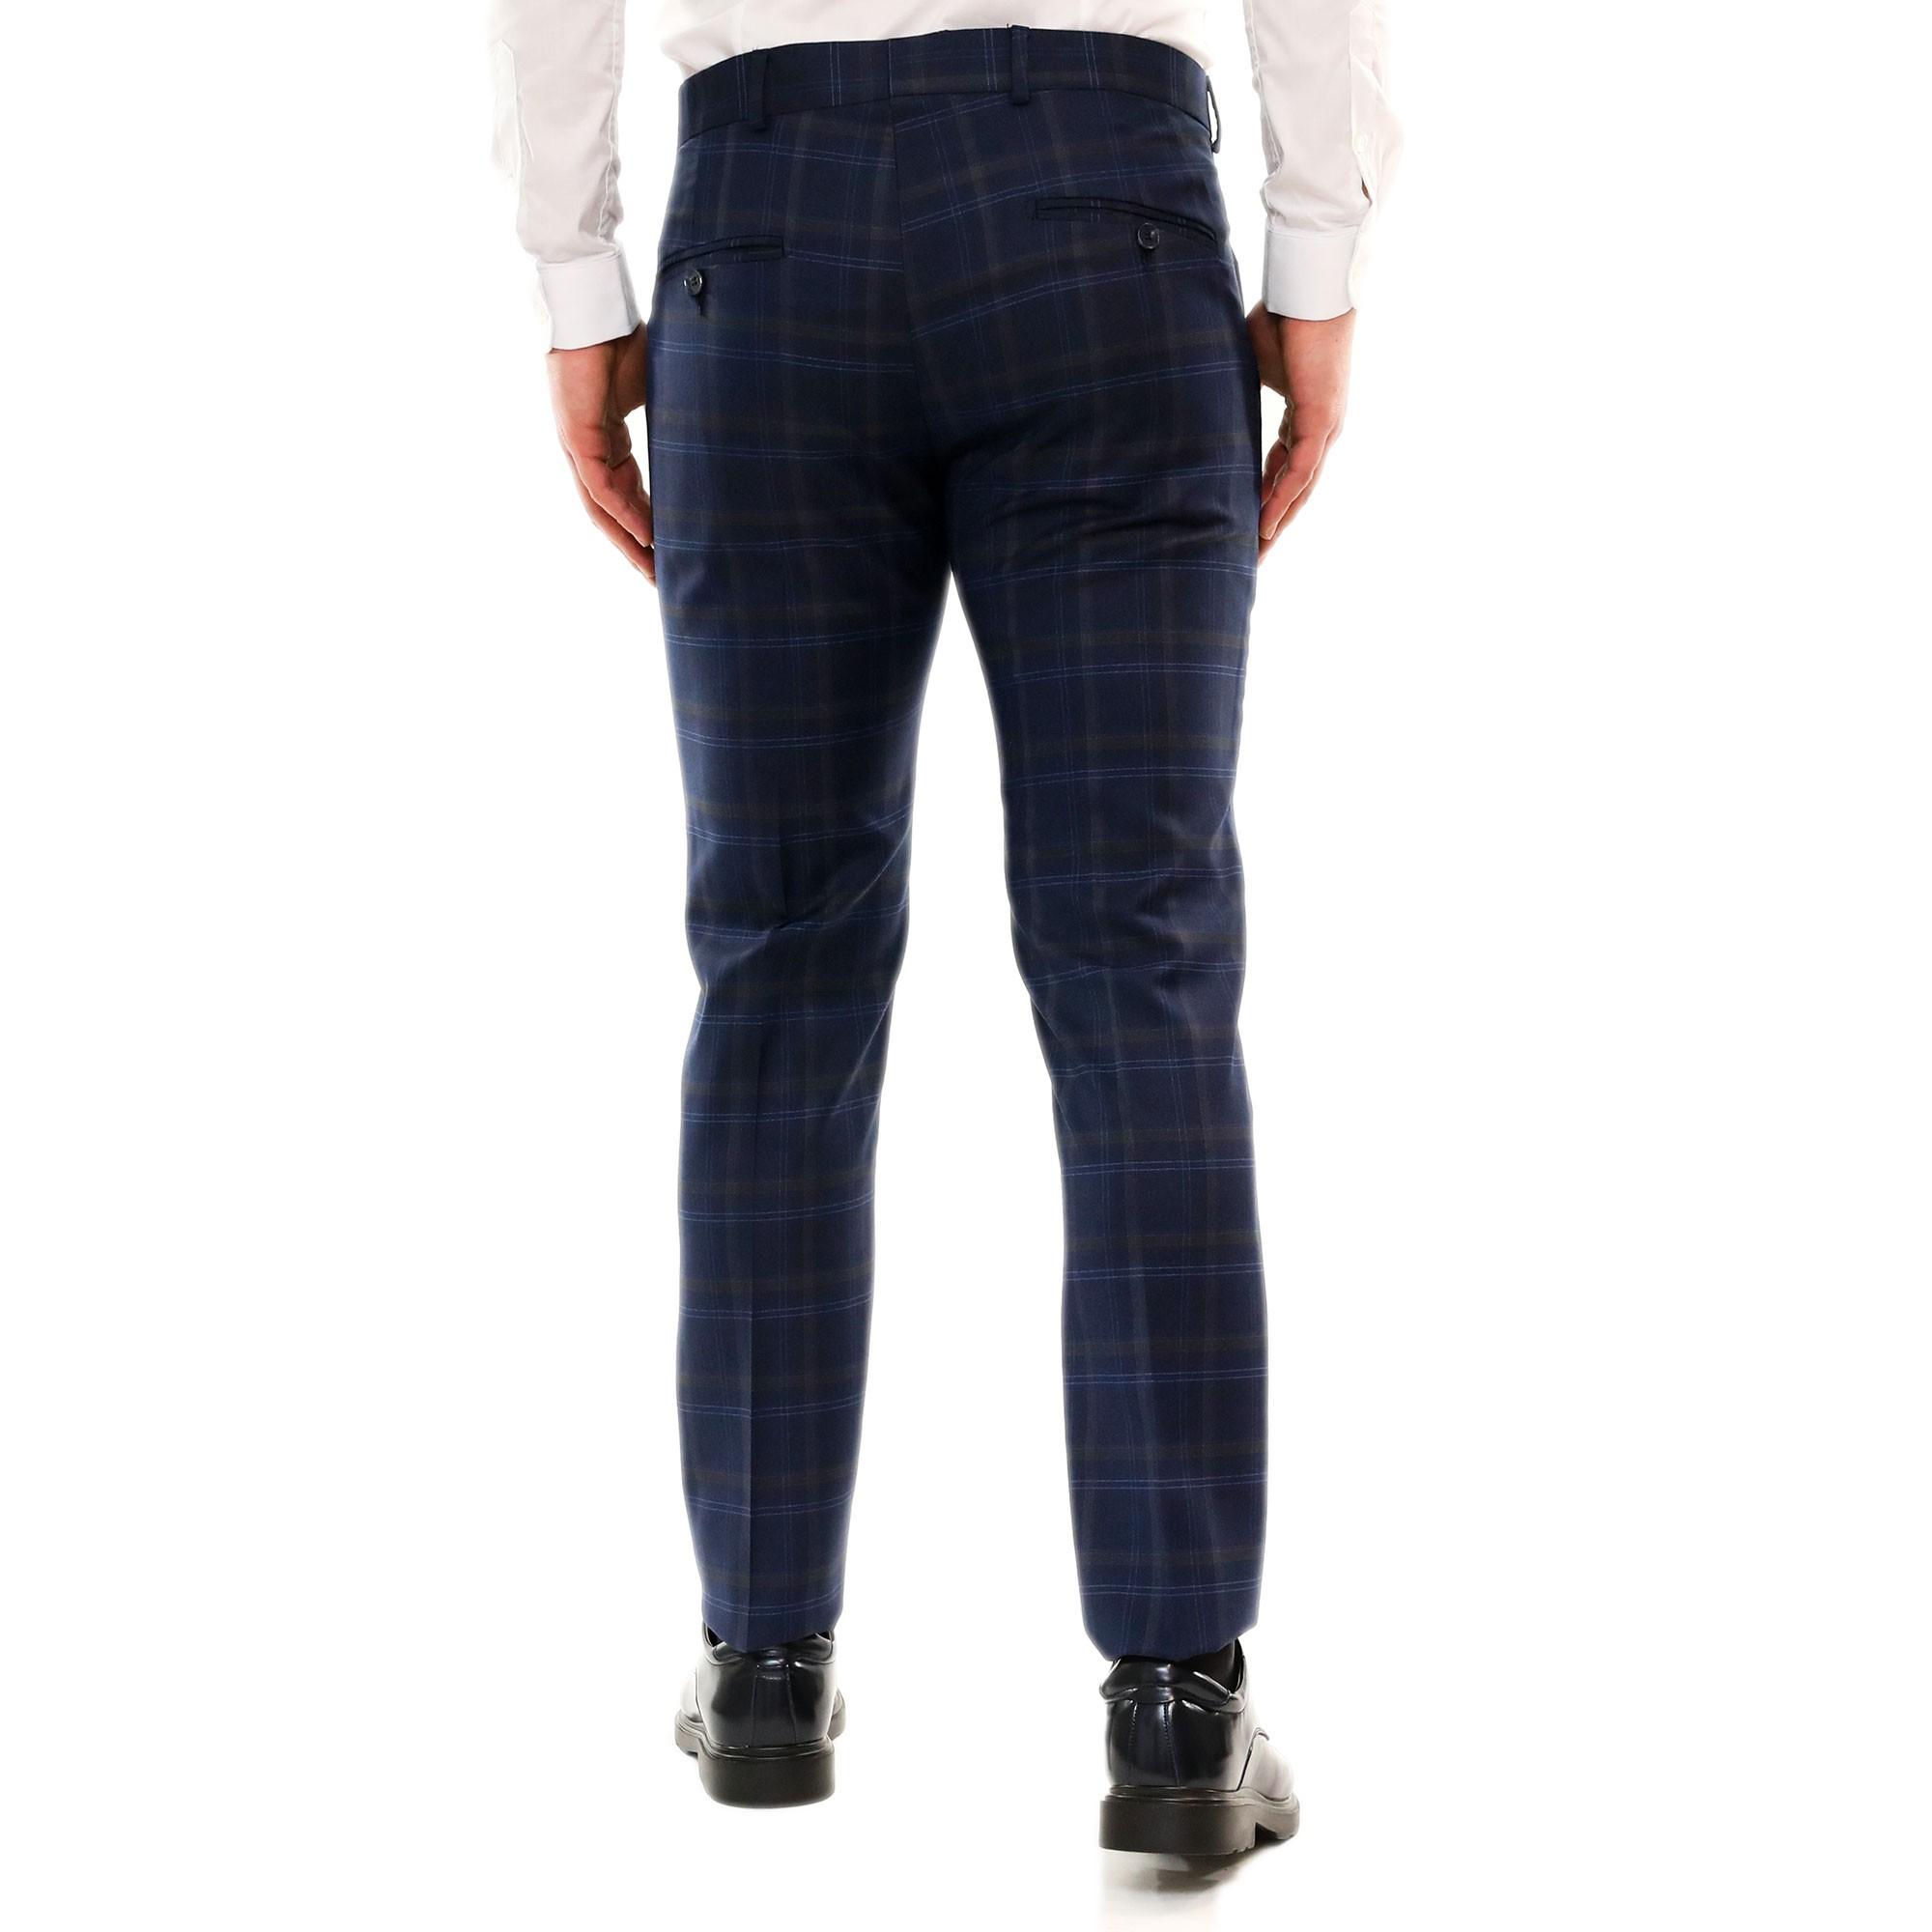 Pantaloni-Uomo-Chino-Cotone-Elegante-Estivi-Abito-Estivo-Tasca-America miniatura 4